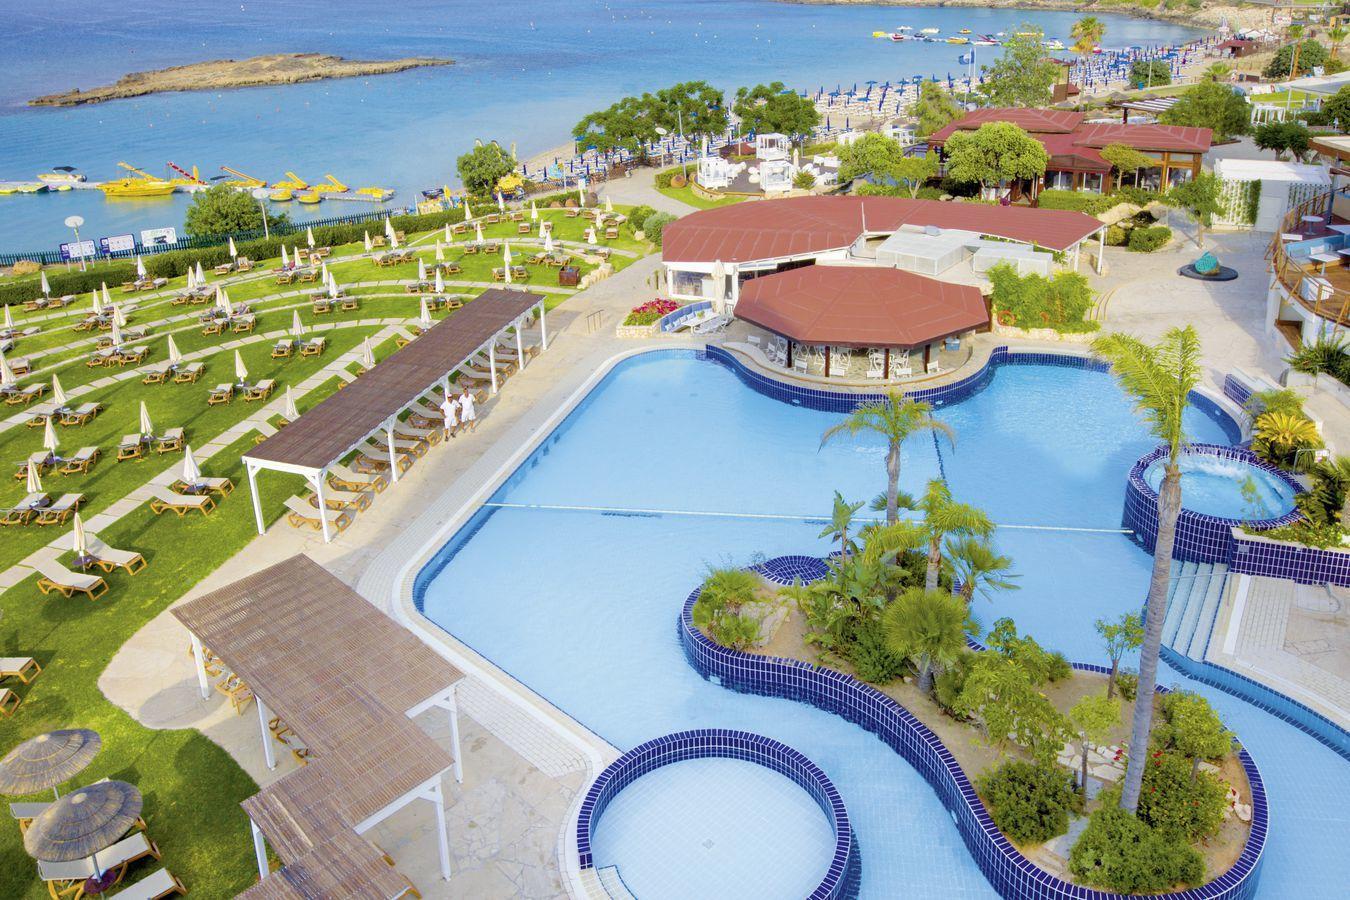 Hotel Capo Bay Hotel